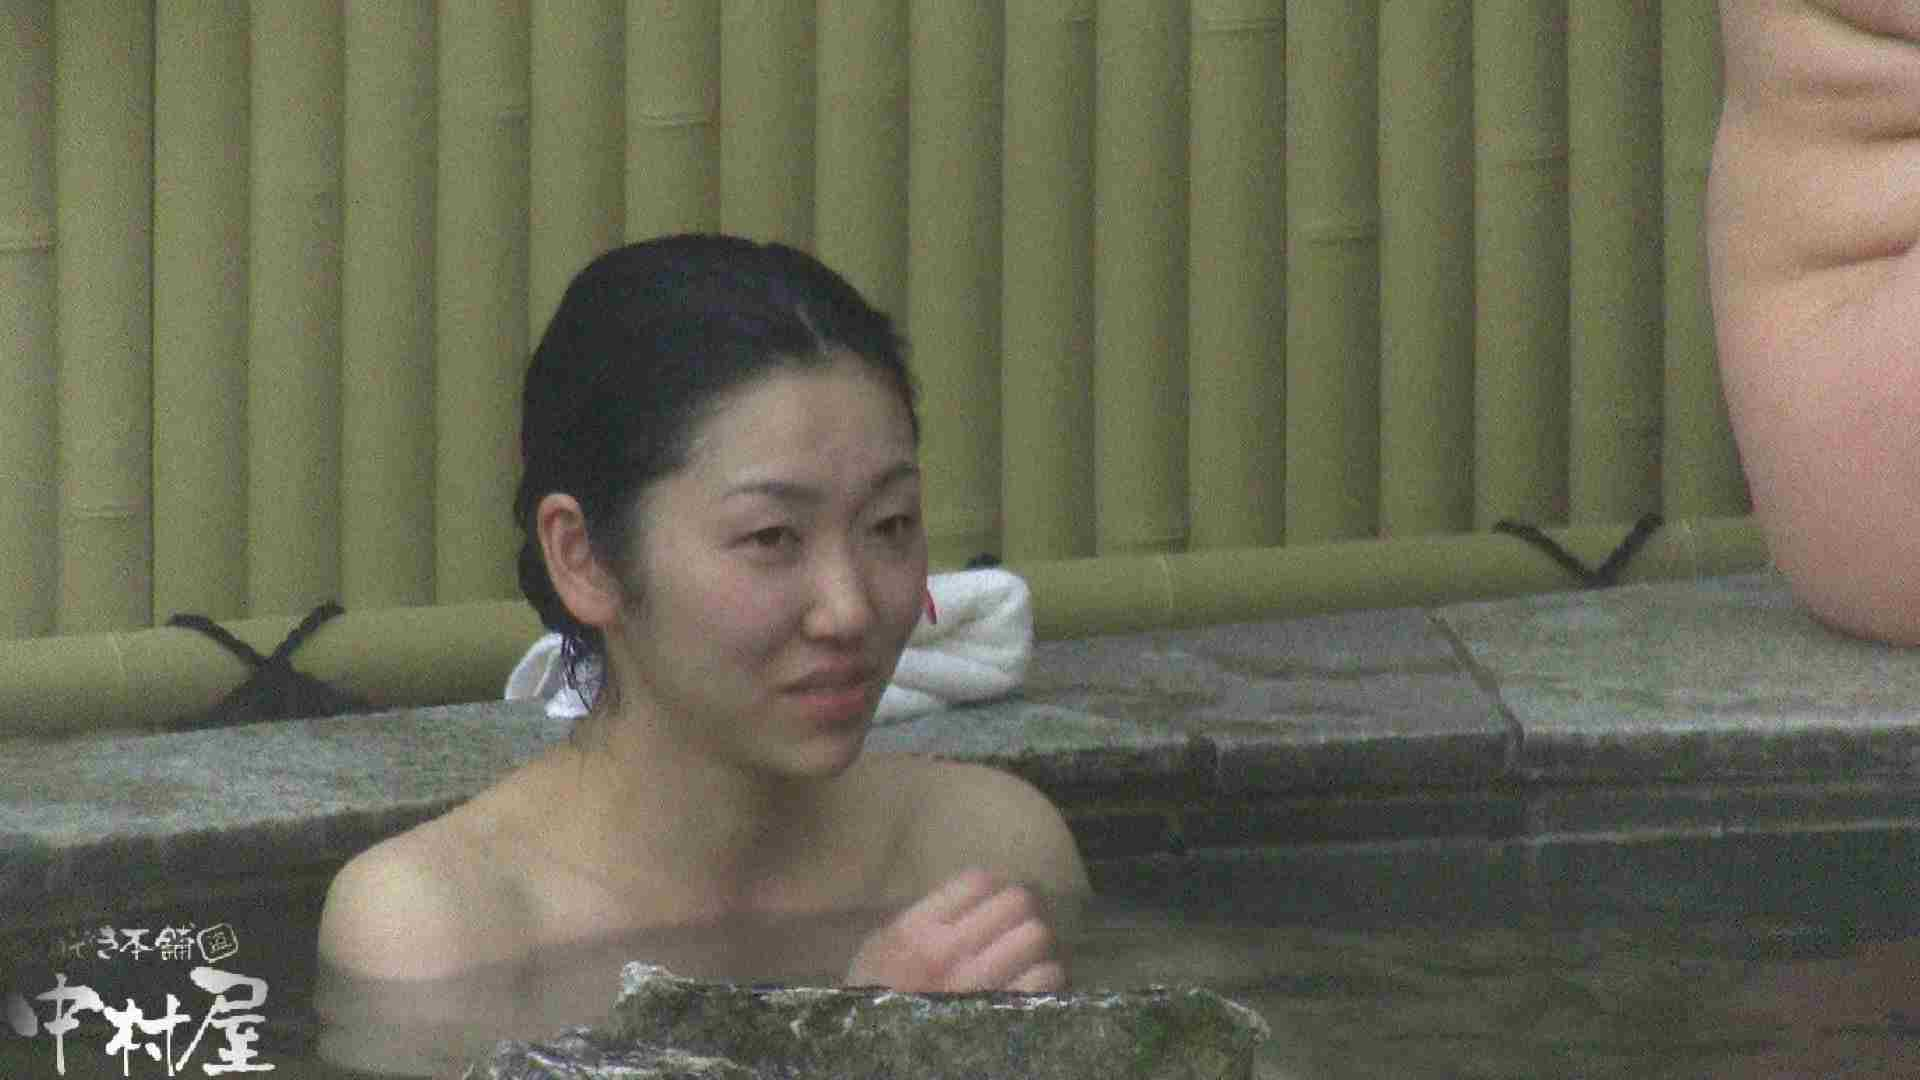 Aquaな露天風呂Vol.917 盗撮シリーズ   露天風呂編  108PIX 51